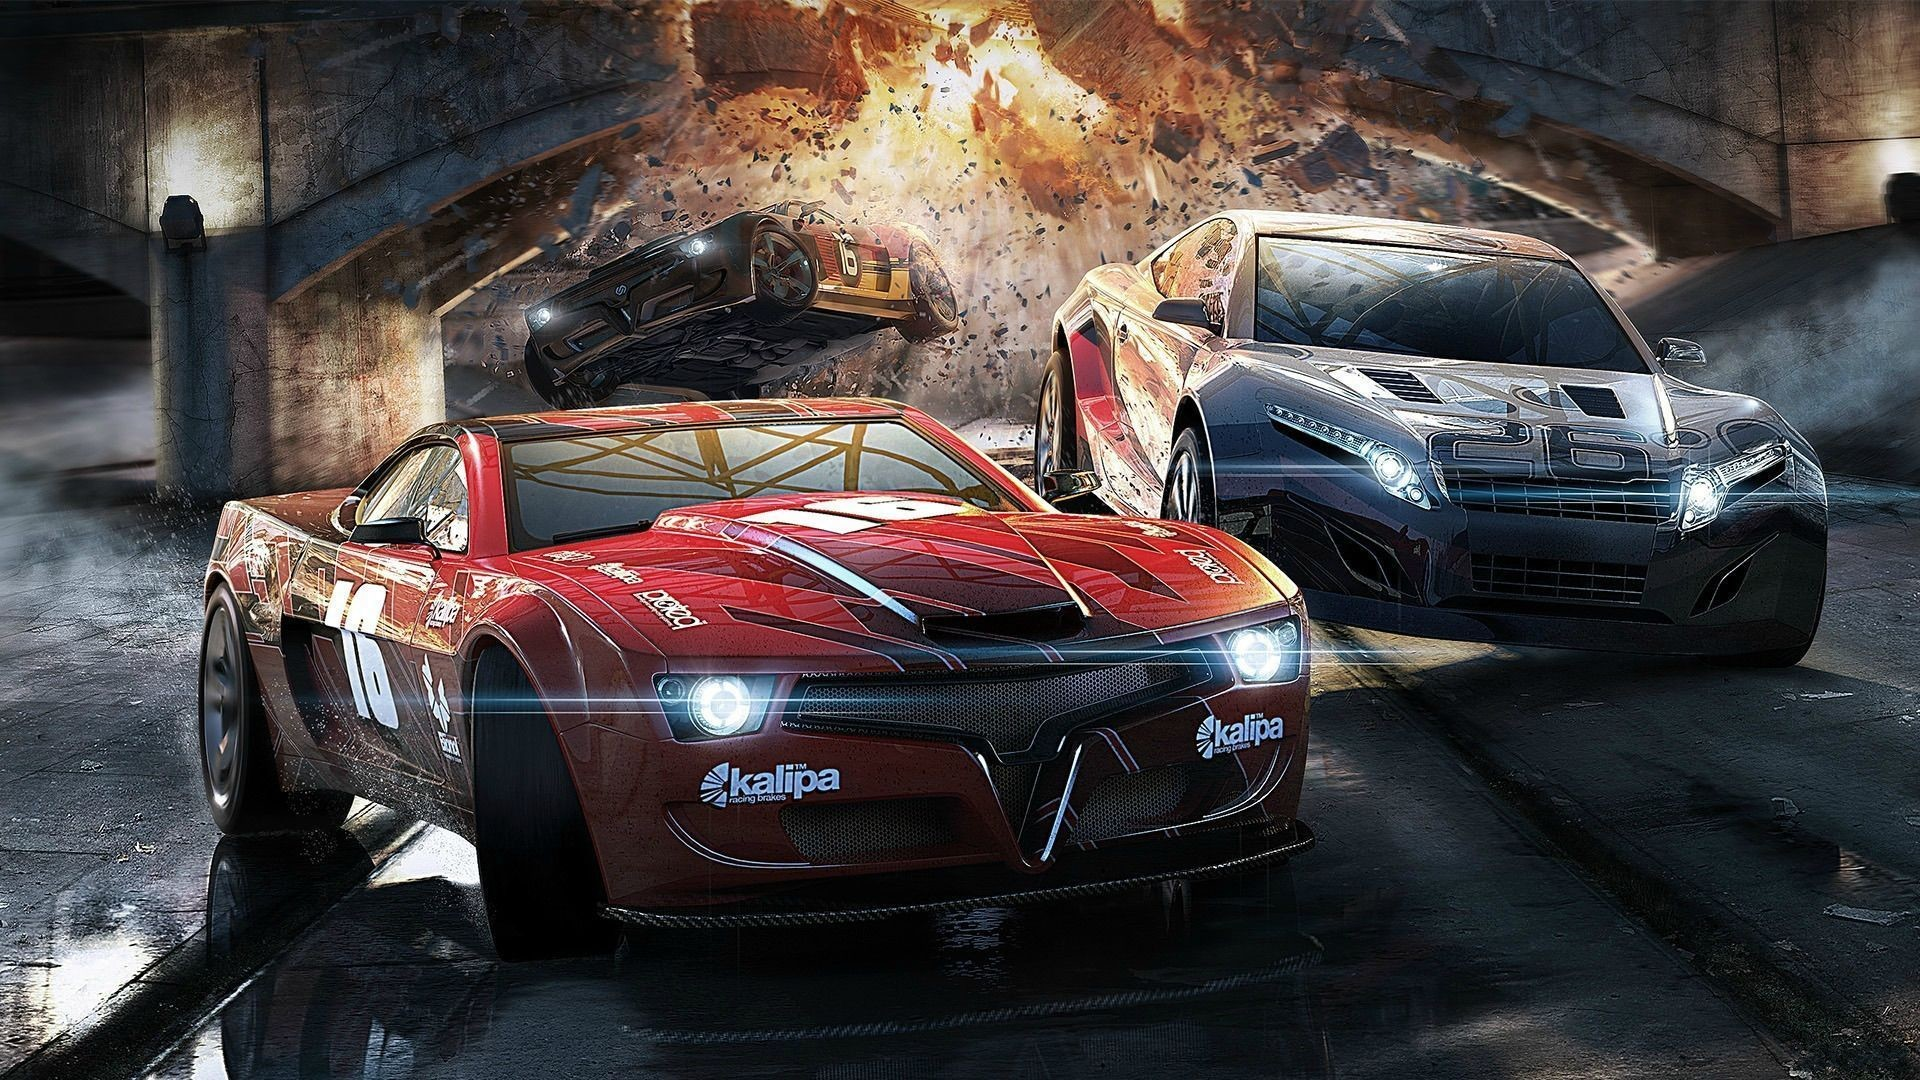 Street Racing Cars Wallpapers – Wallpaper Cave